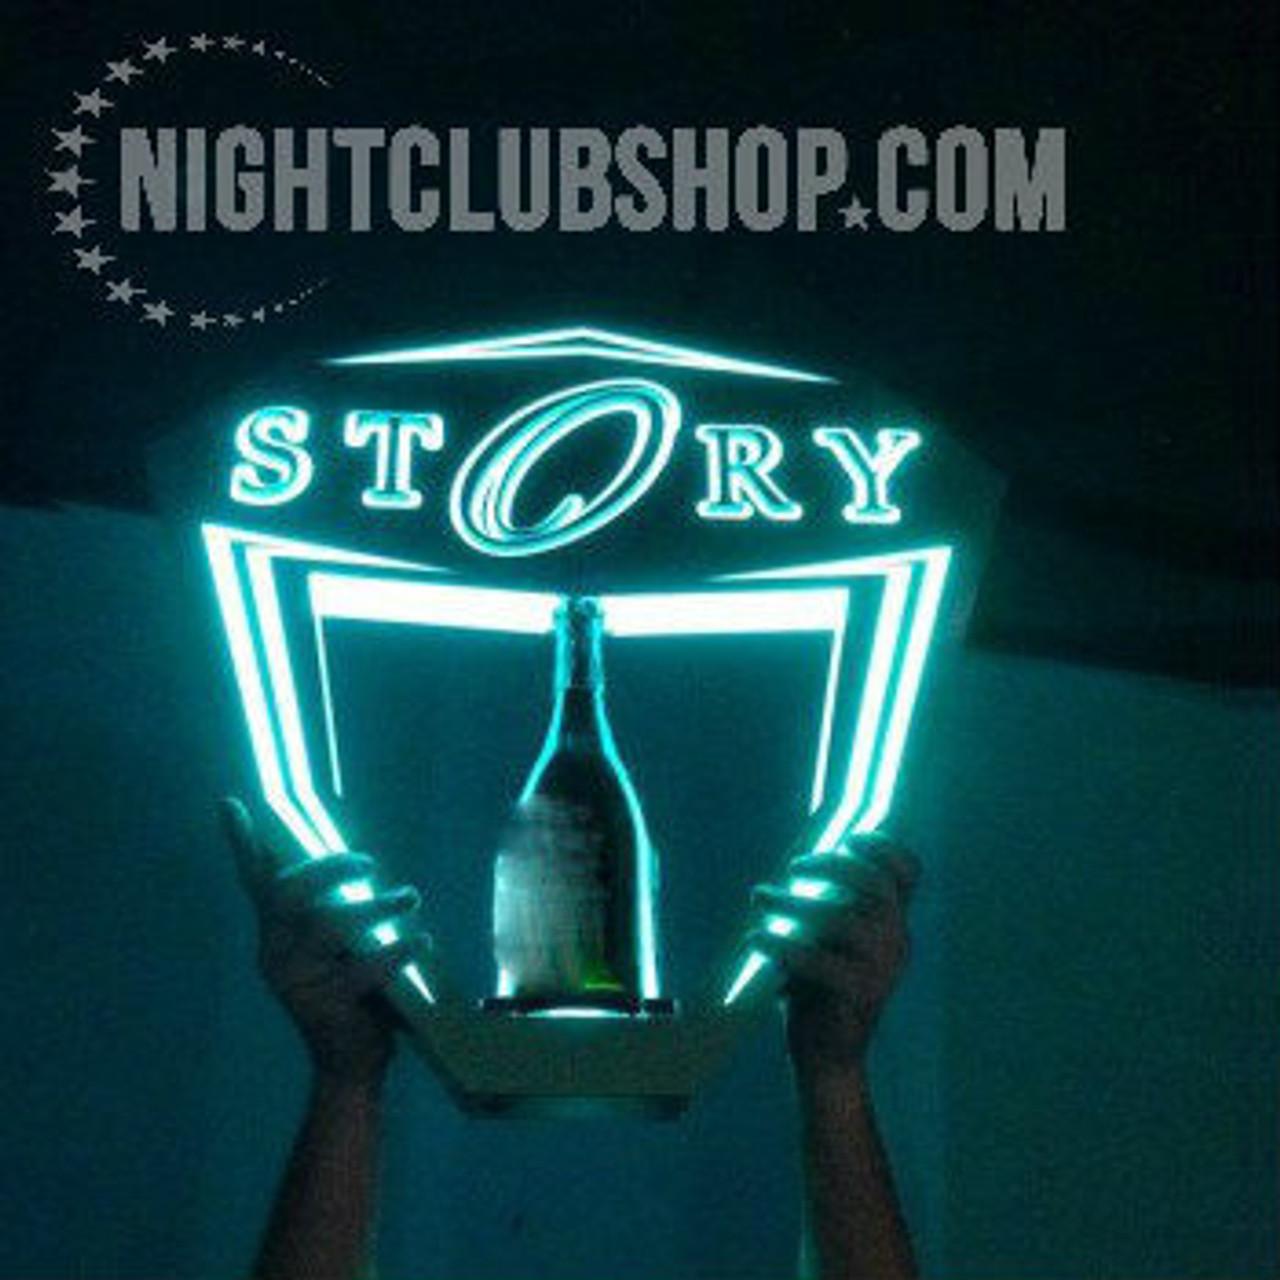 Champagne, 750 ml., Bottle,Service,Delivery,Hypemakerz,presentation, presenter,LED,LIV,Tray, Hype,STORY